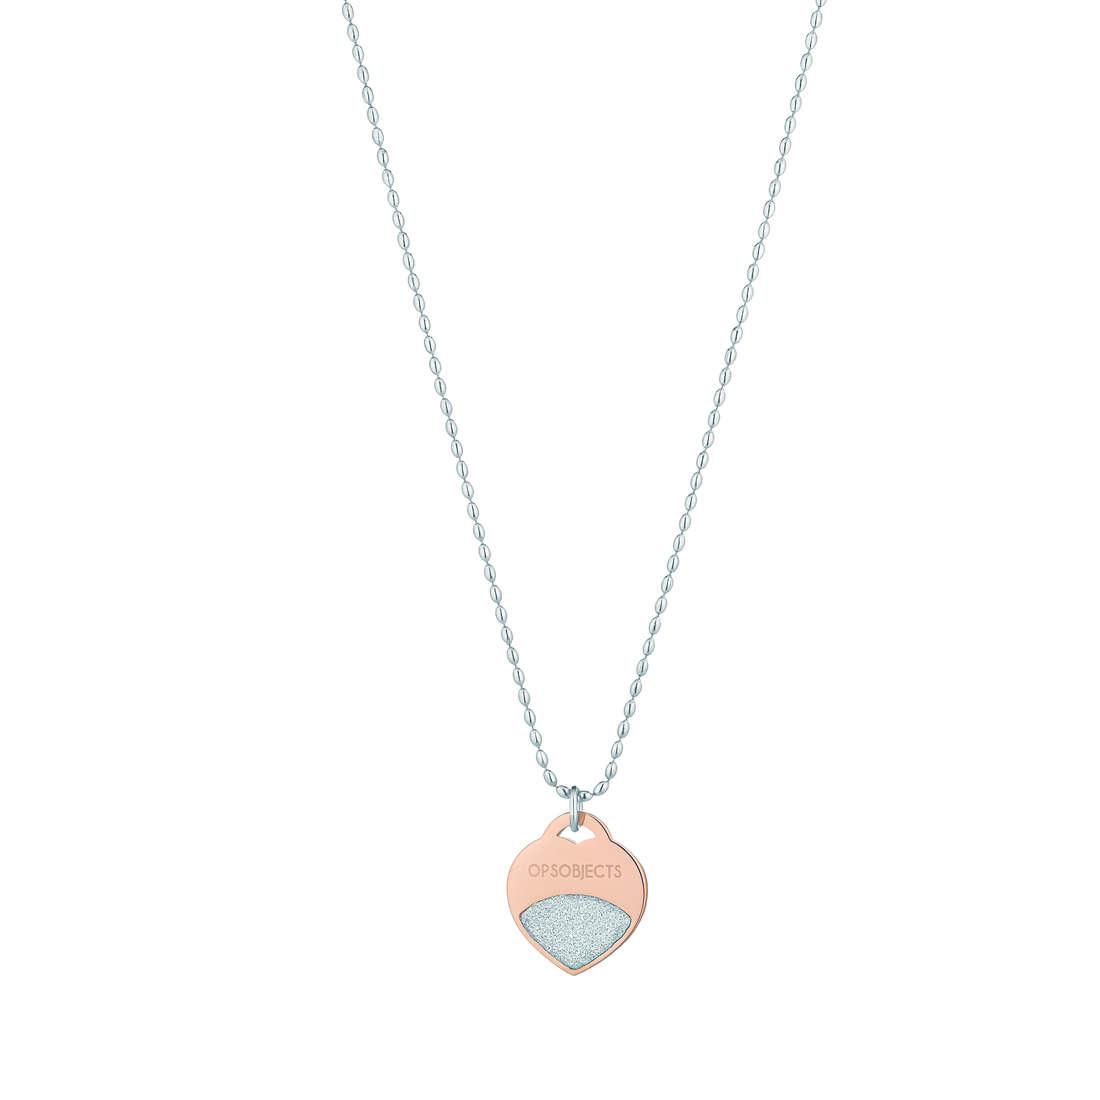 collier femme bijoux Ops Objects Glitter OPSCL-352